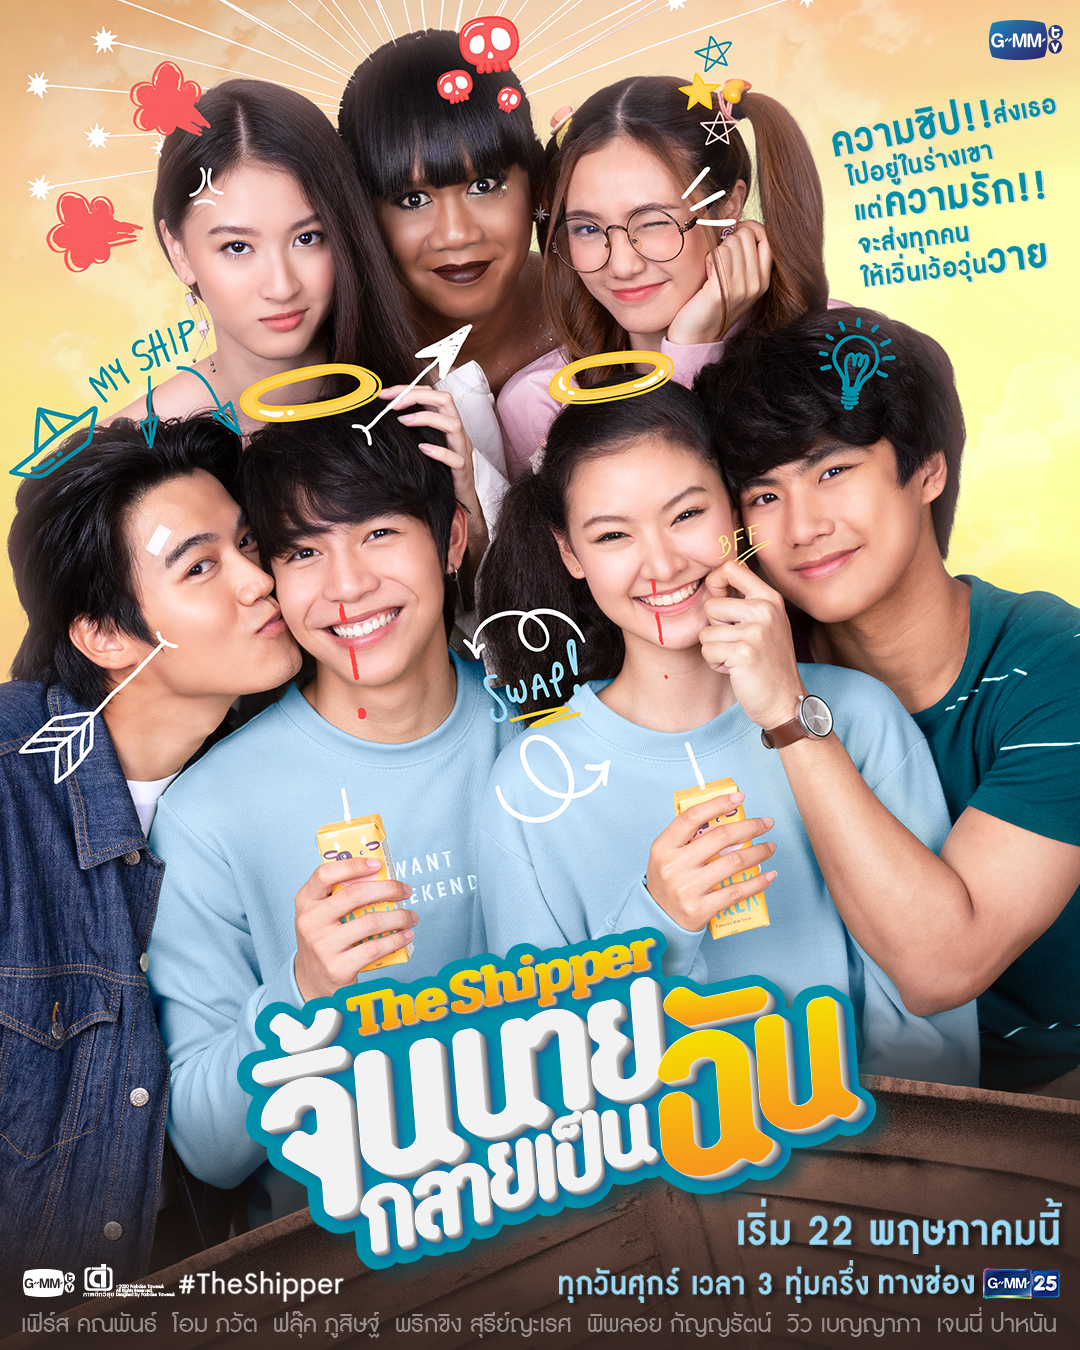 The Shipper (Drama Thailand) : Sinopsis dan Review